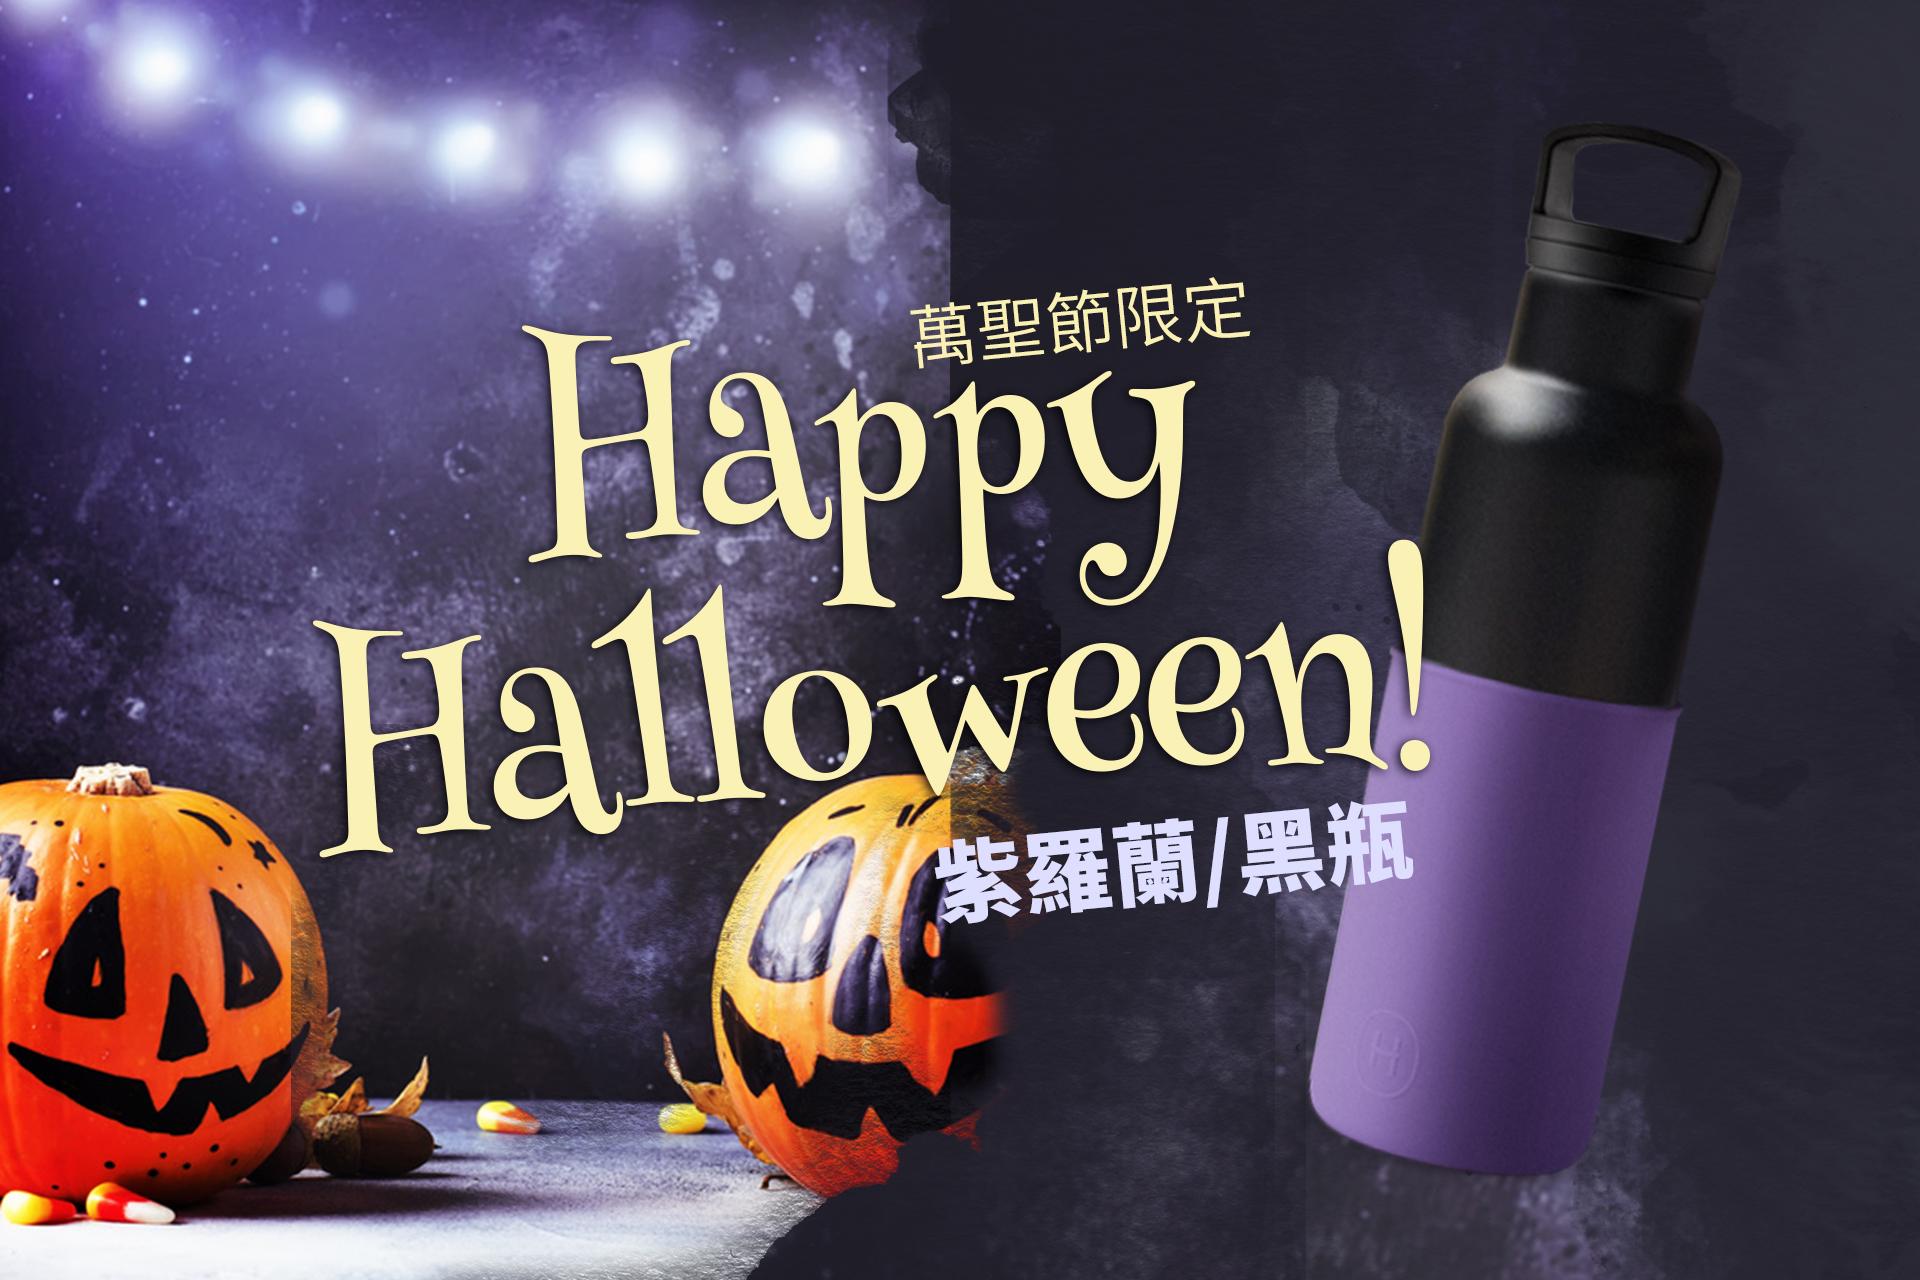 HYDY, 保溫水瓶,美國HYDY, HYDY保溫瓶, 來自美國的時尚水瓶, IG部落客推薦, 五星好評, 不鏽鋼, 保溫, 保冷, 進口